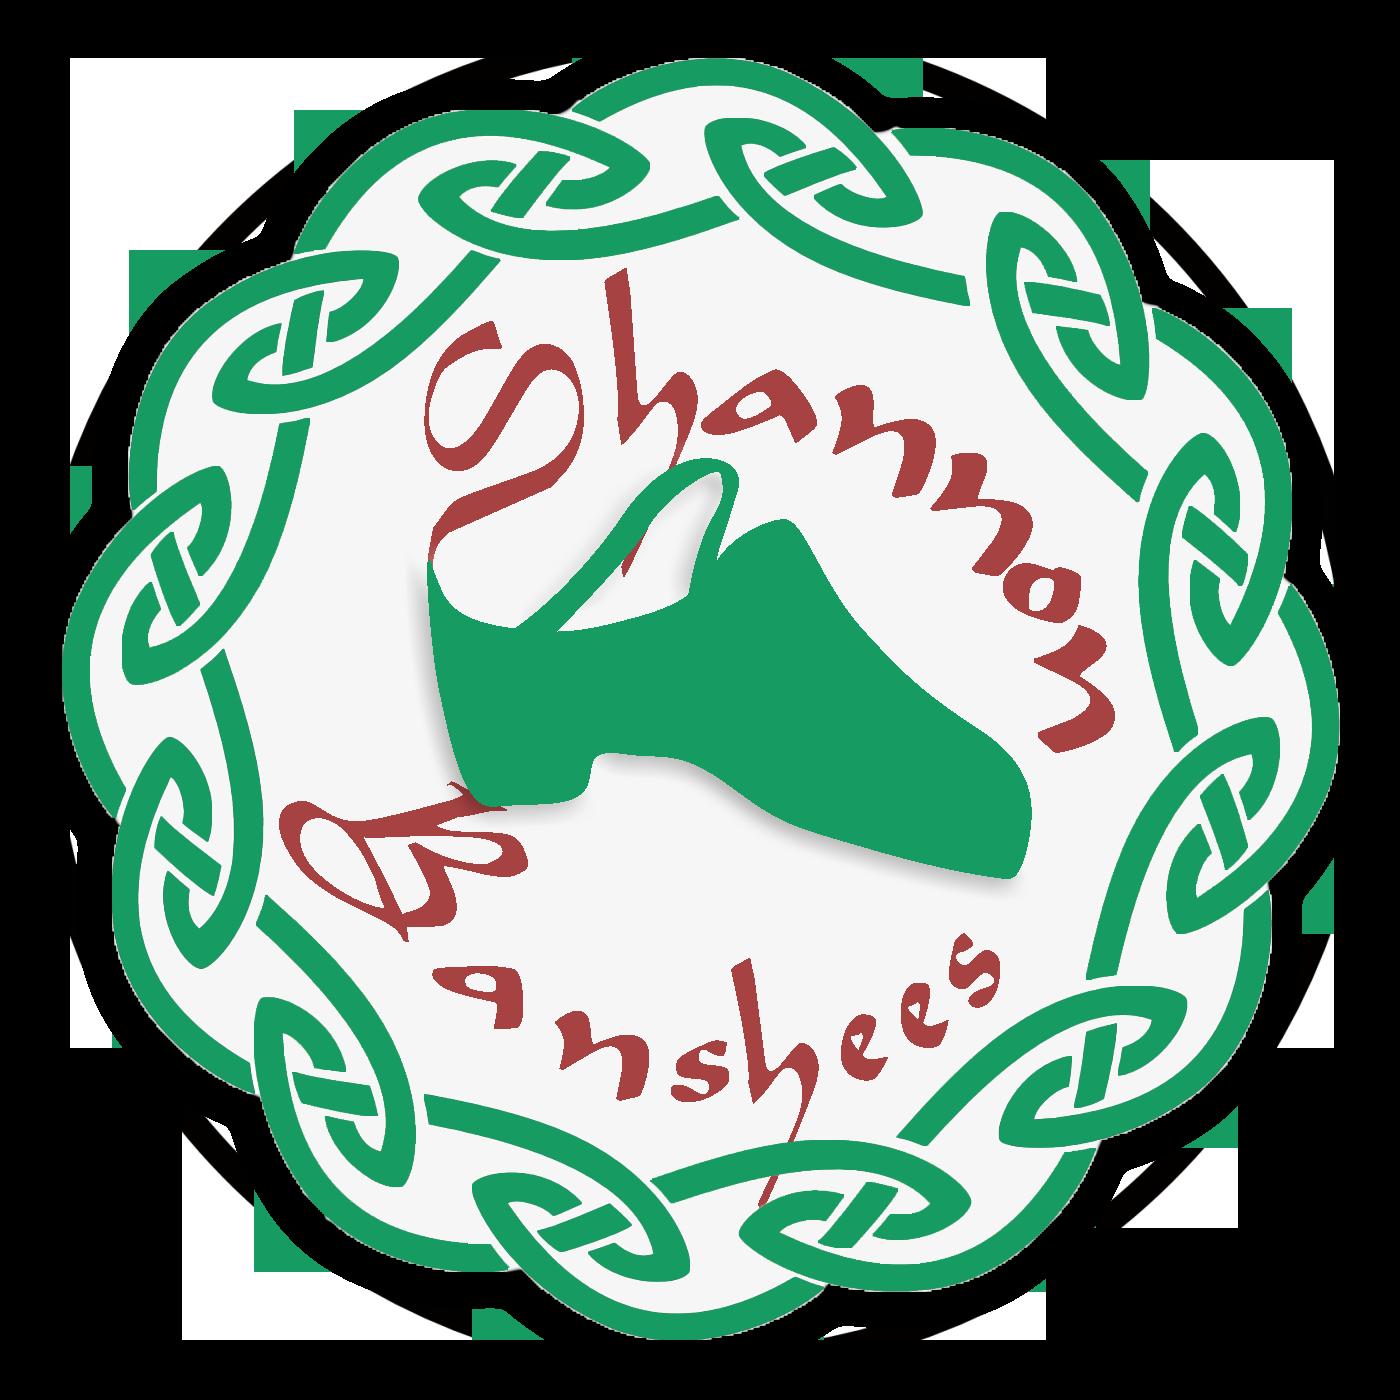 Shannon Banshees